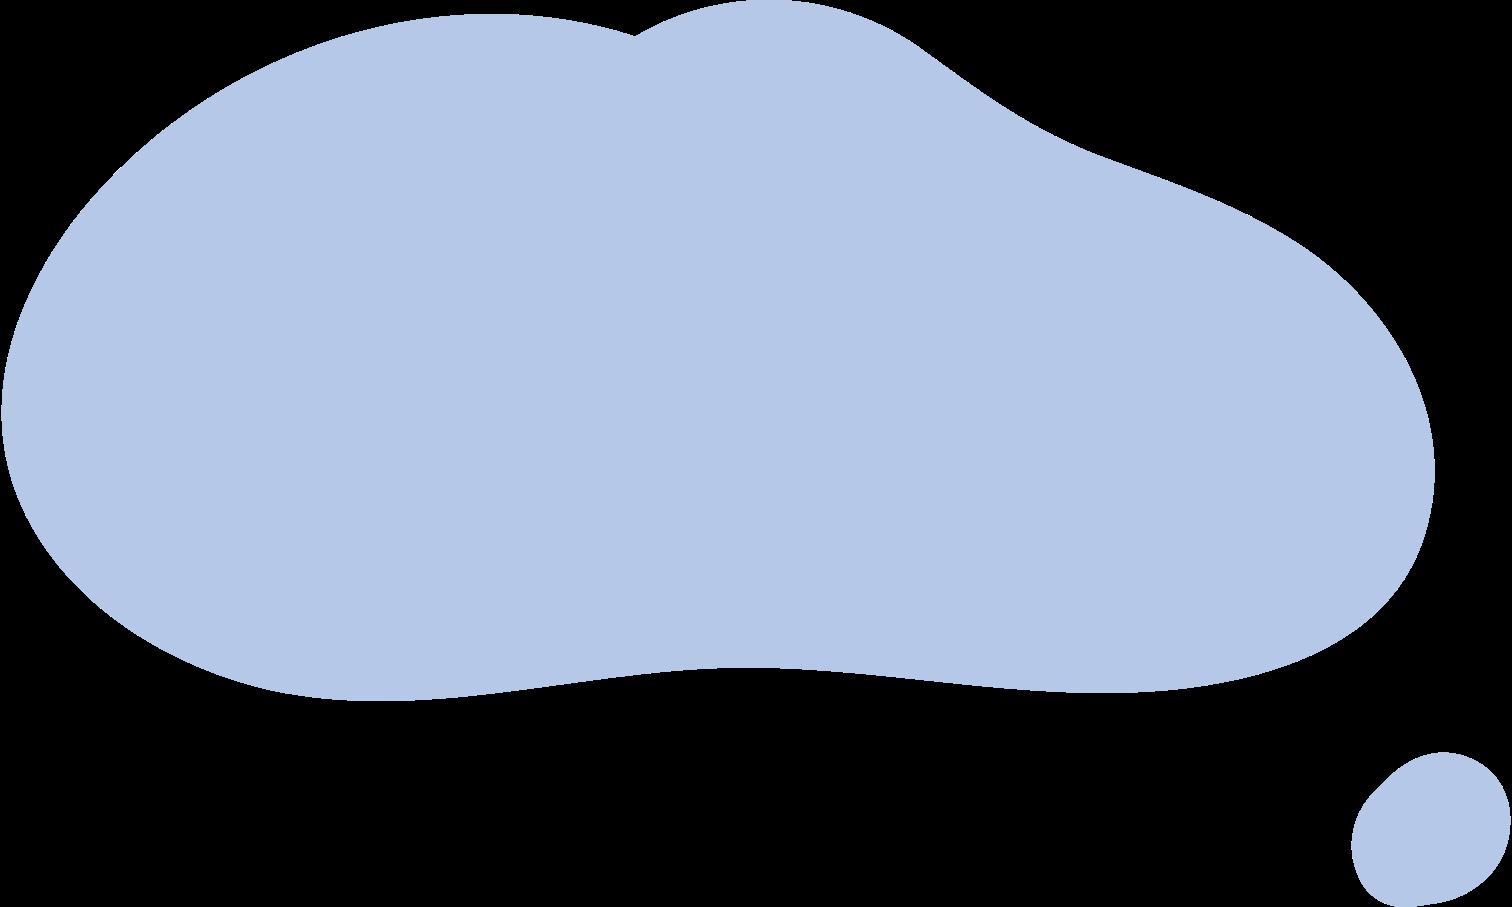 dialog cloud Clipart illustration in PNG, SVG